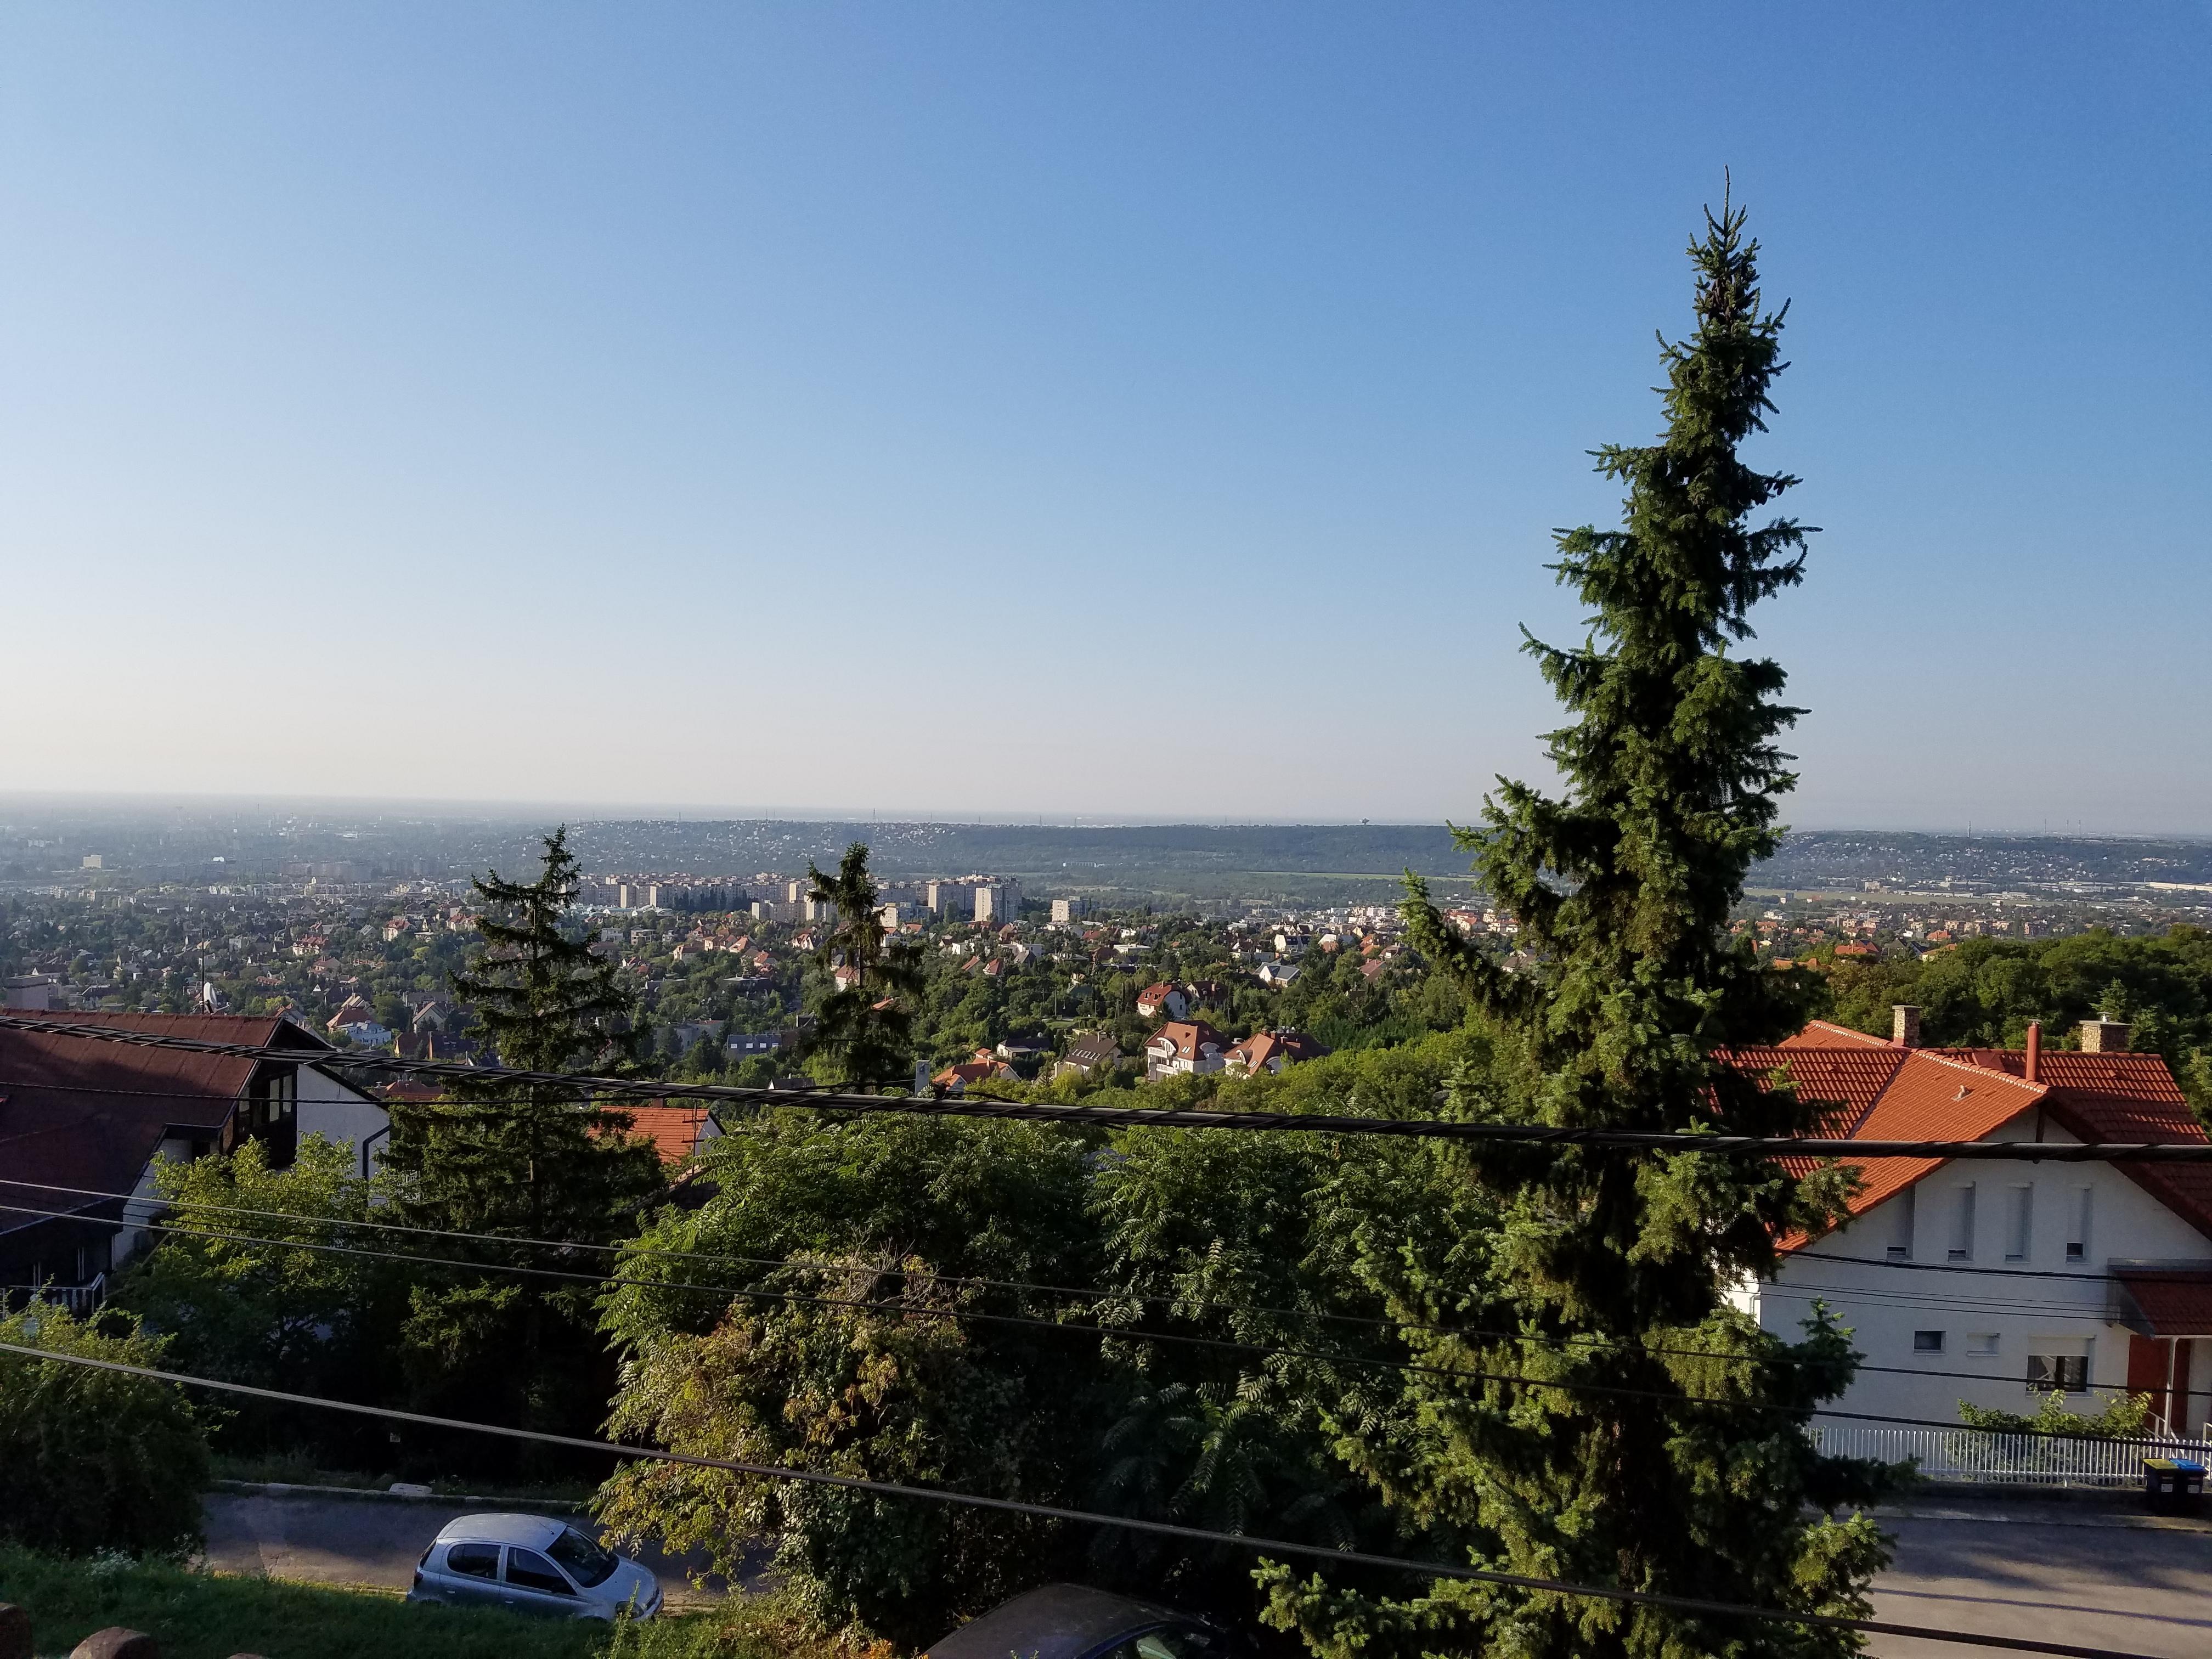 Views south